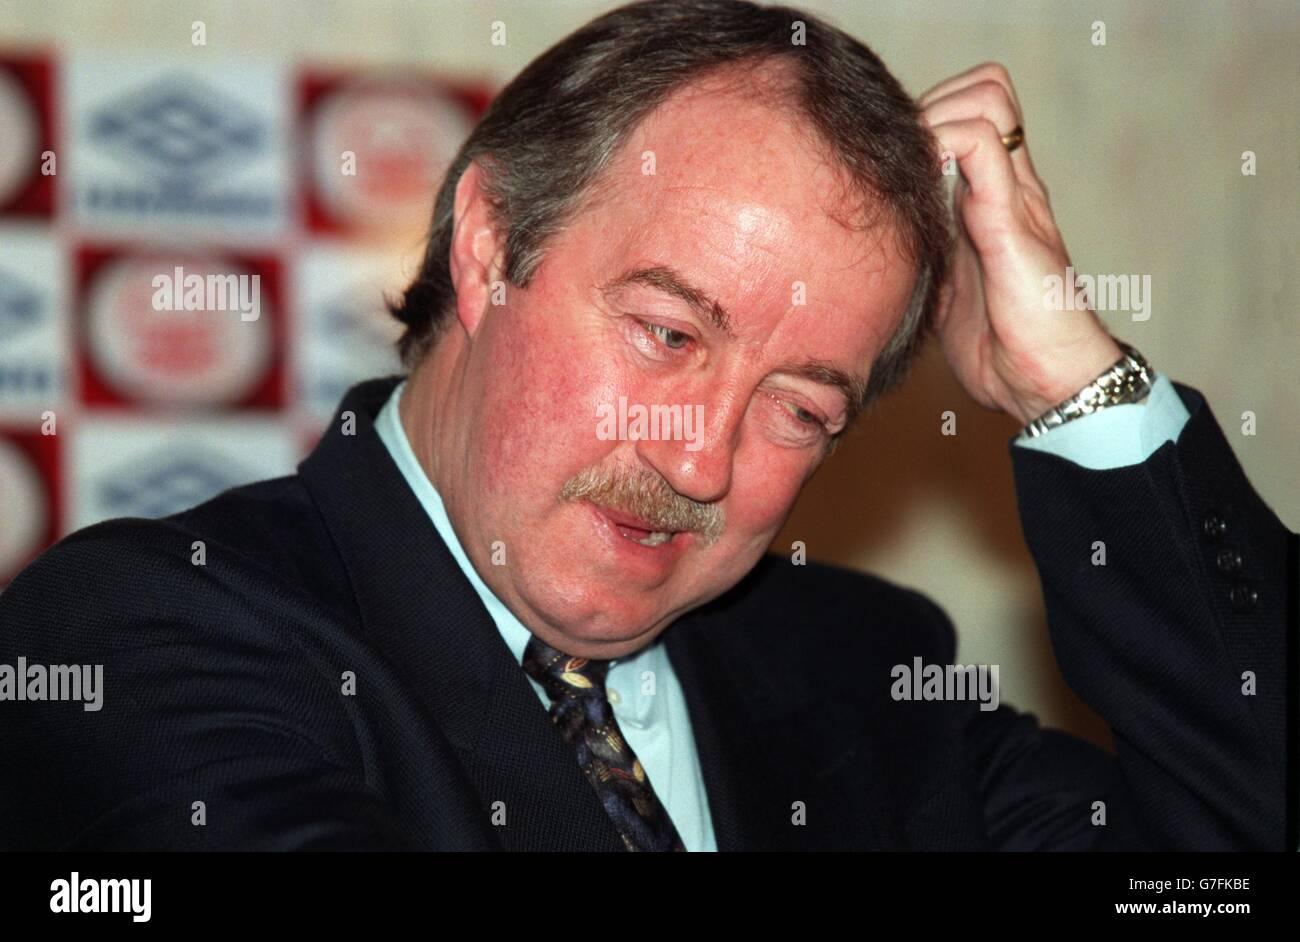 Soccer Frank Clark Resignation Stock Royalty Free Image